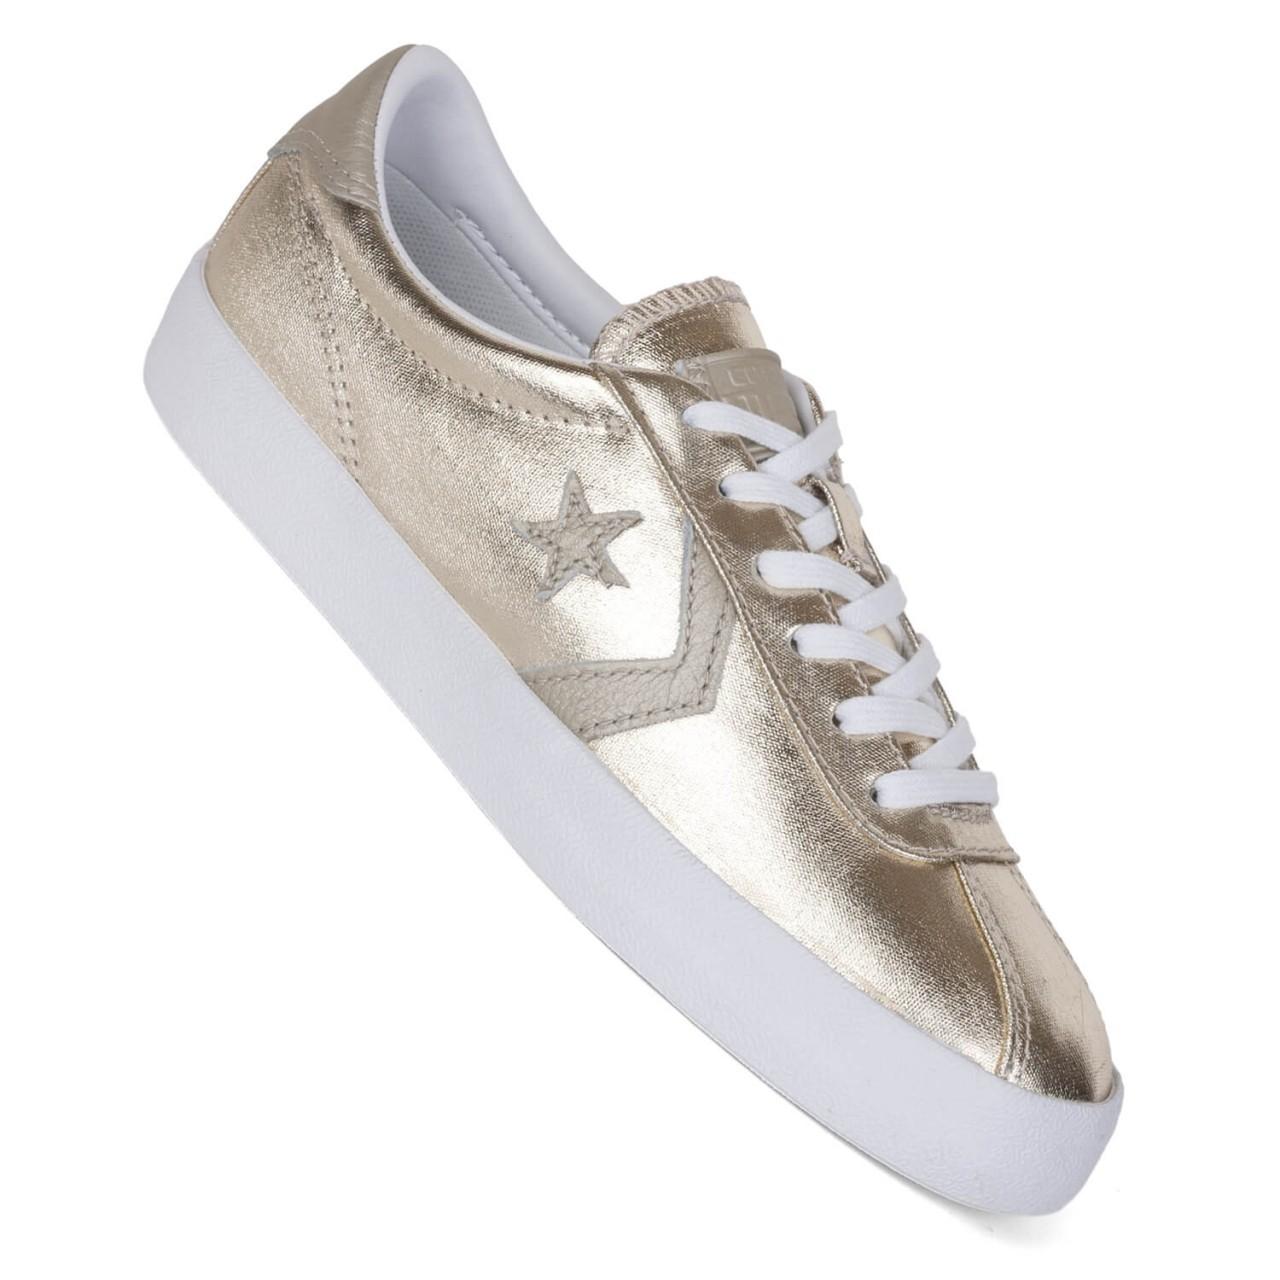 Converse Breakpoint ox light gold - Damen Sneaker im Metallic Look